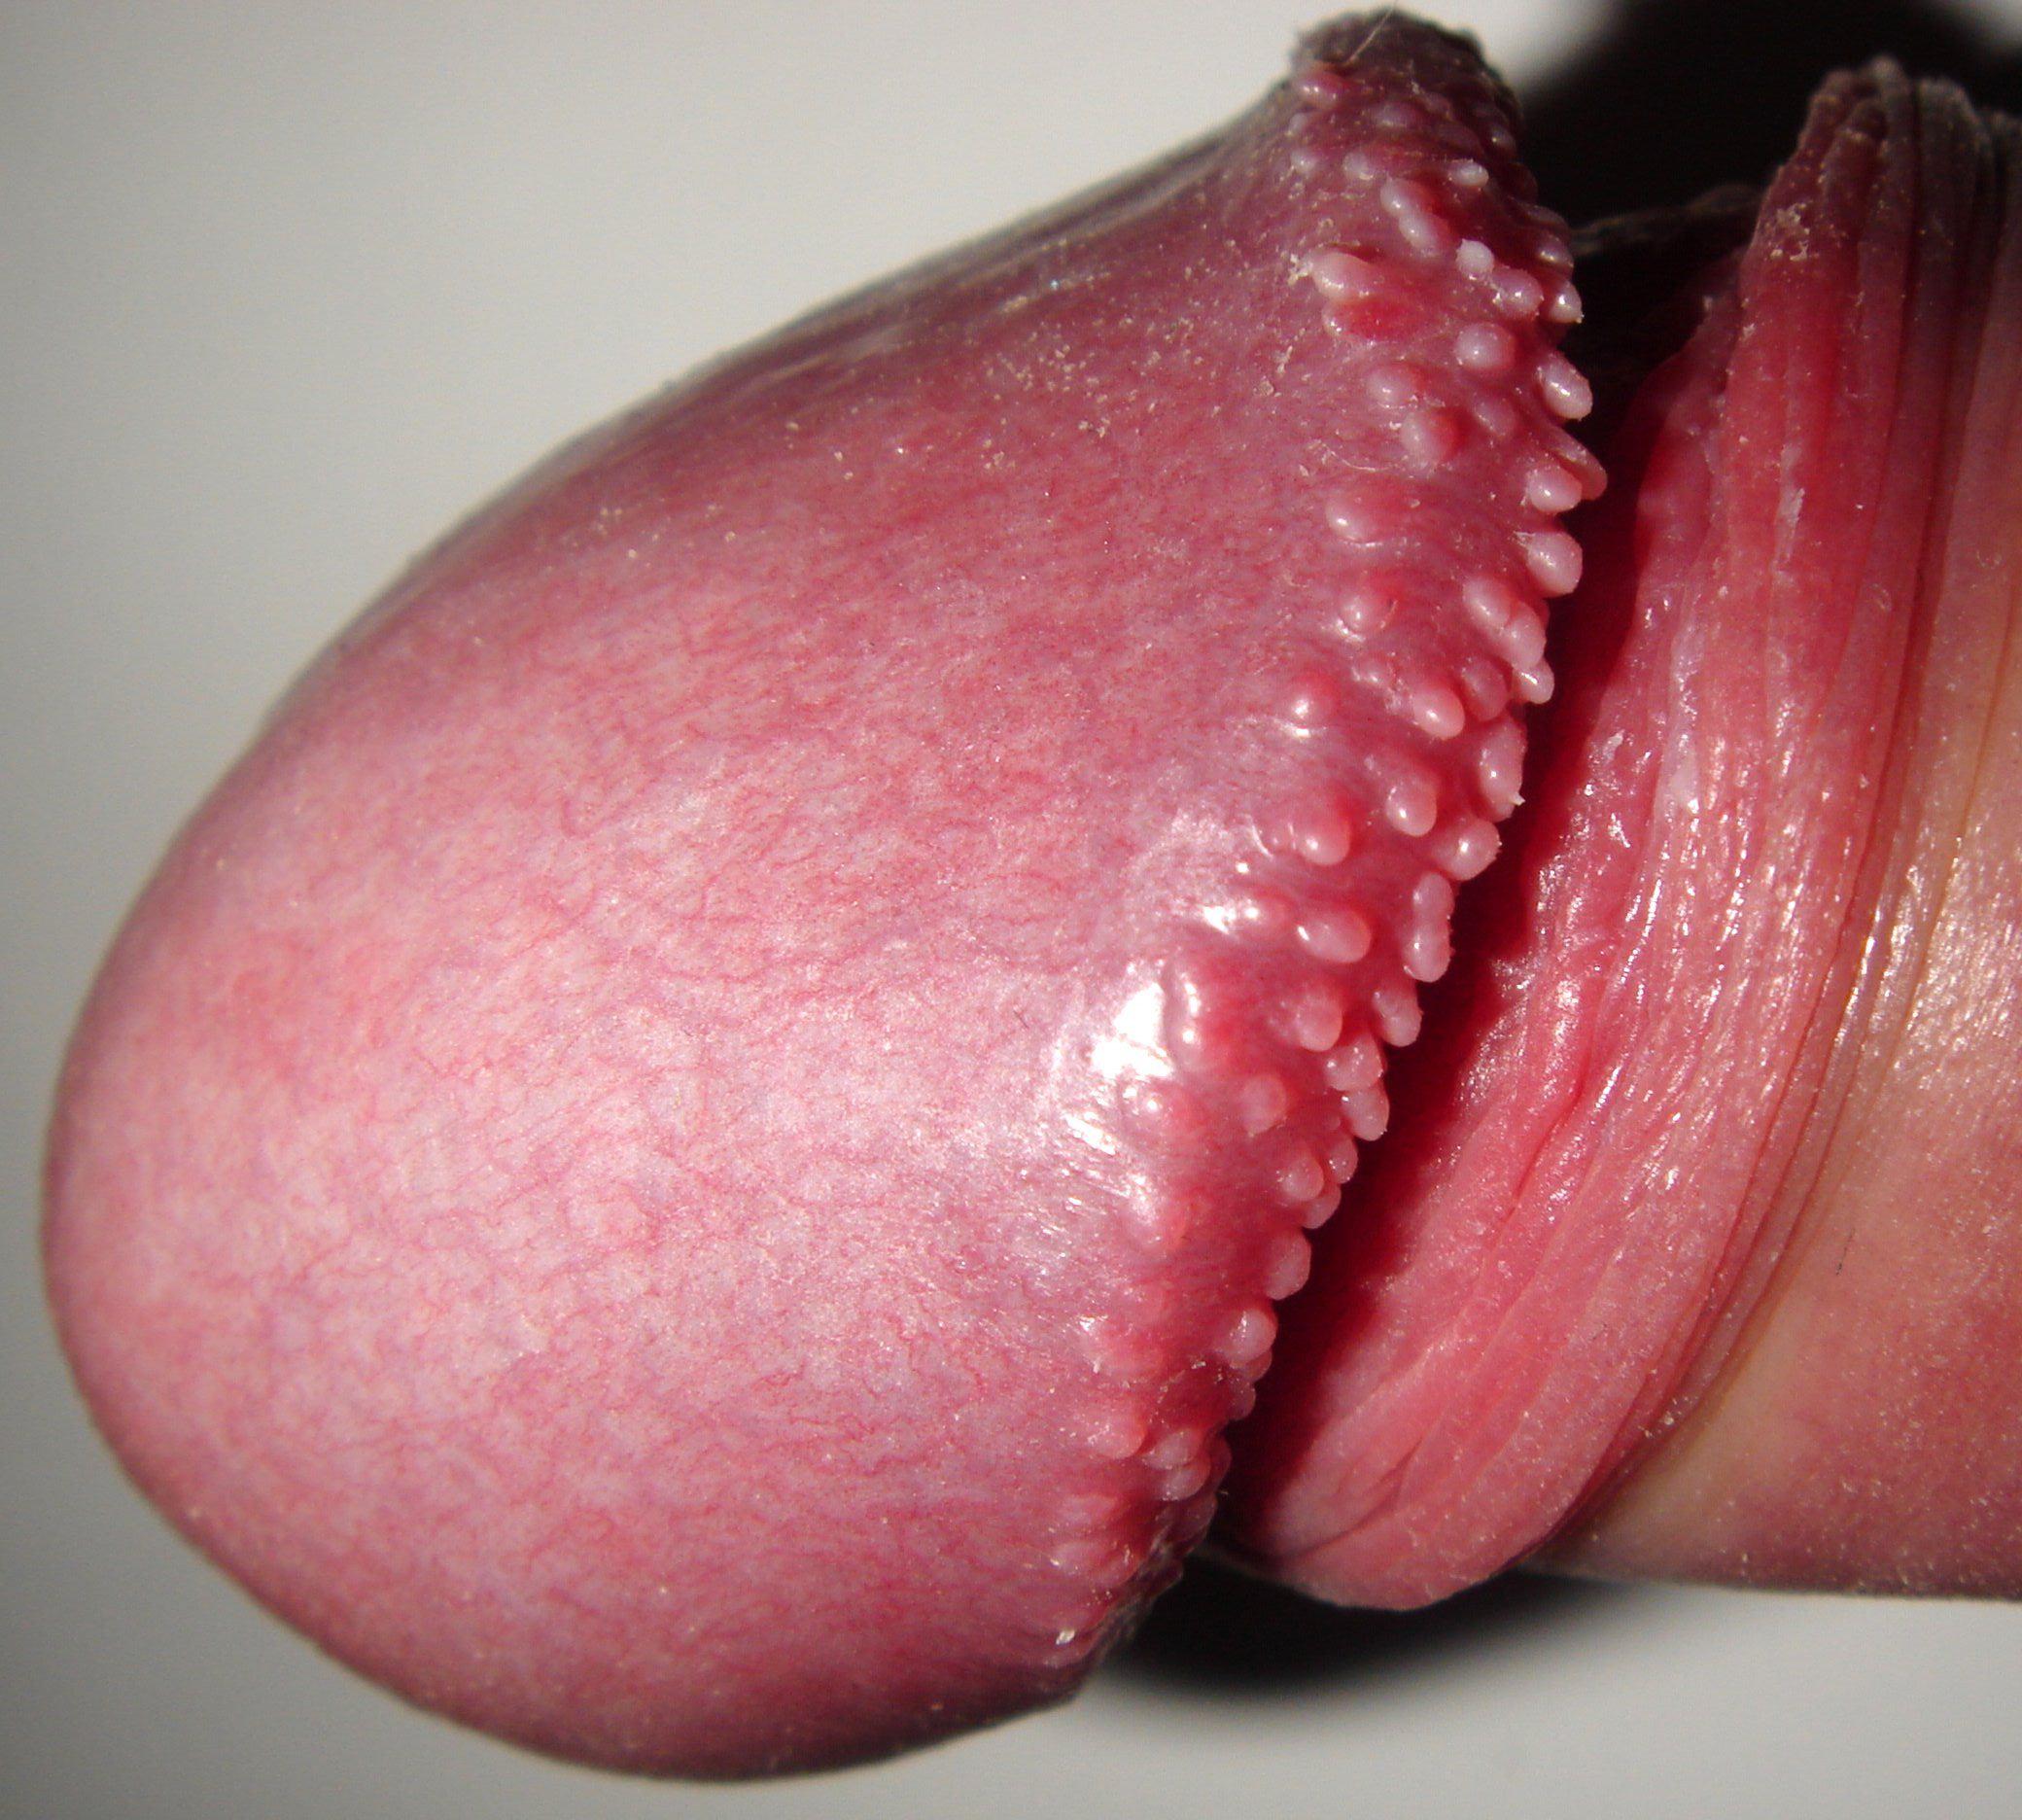 Tratamentul papiloamelor - Dr. Mihai Lupu - medic specialist dermatolog